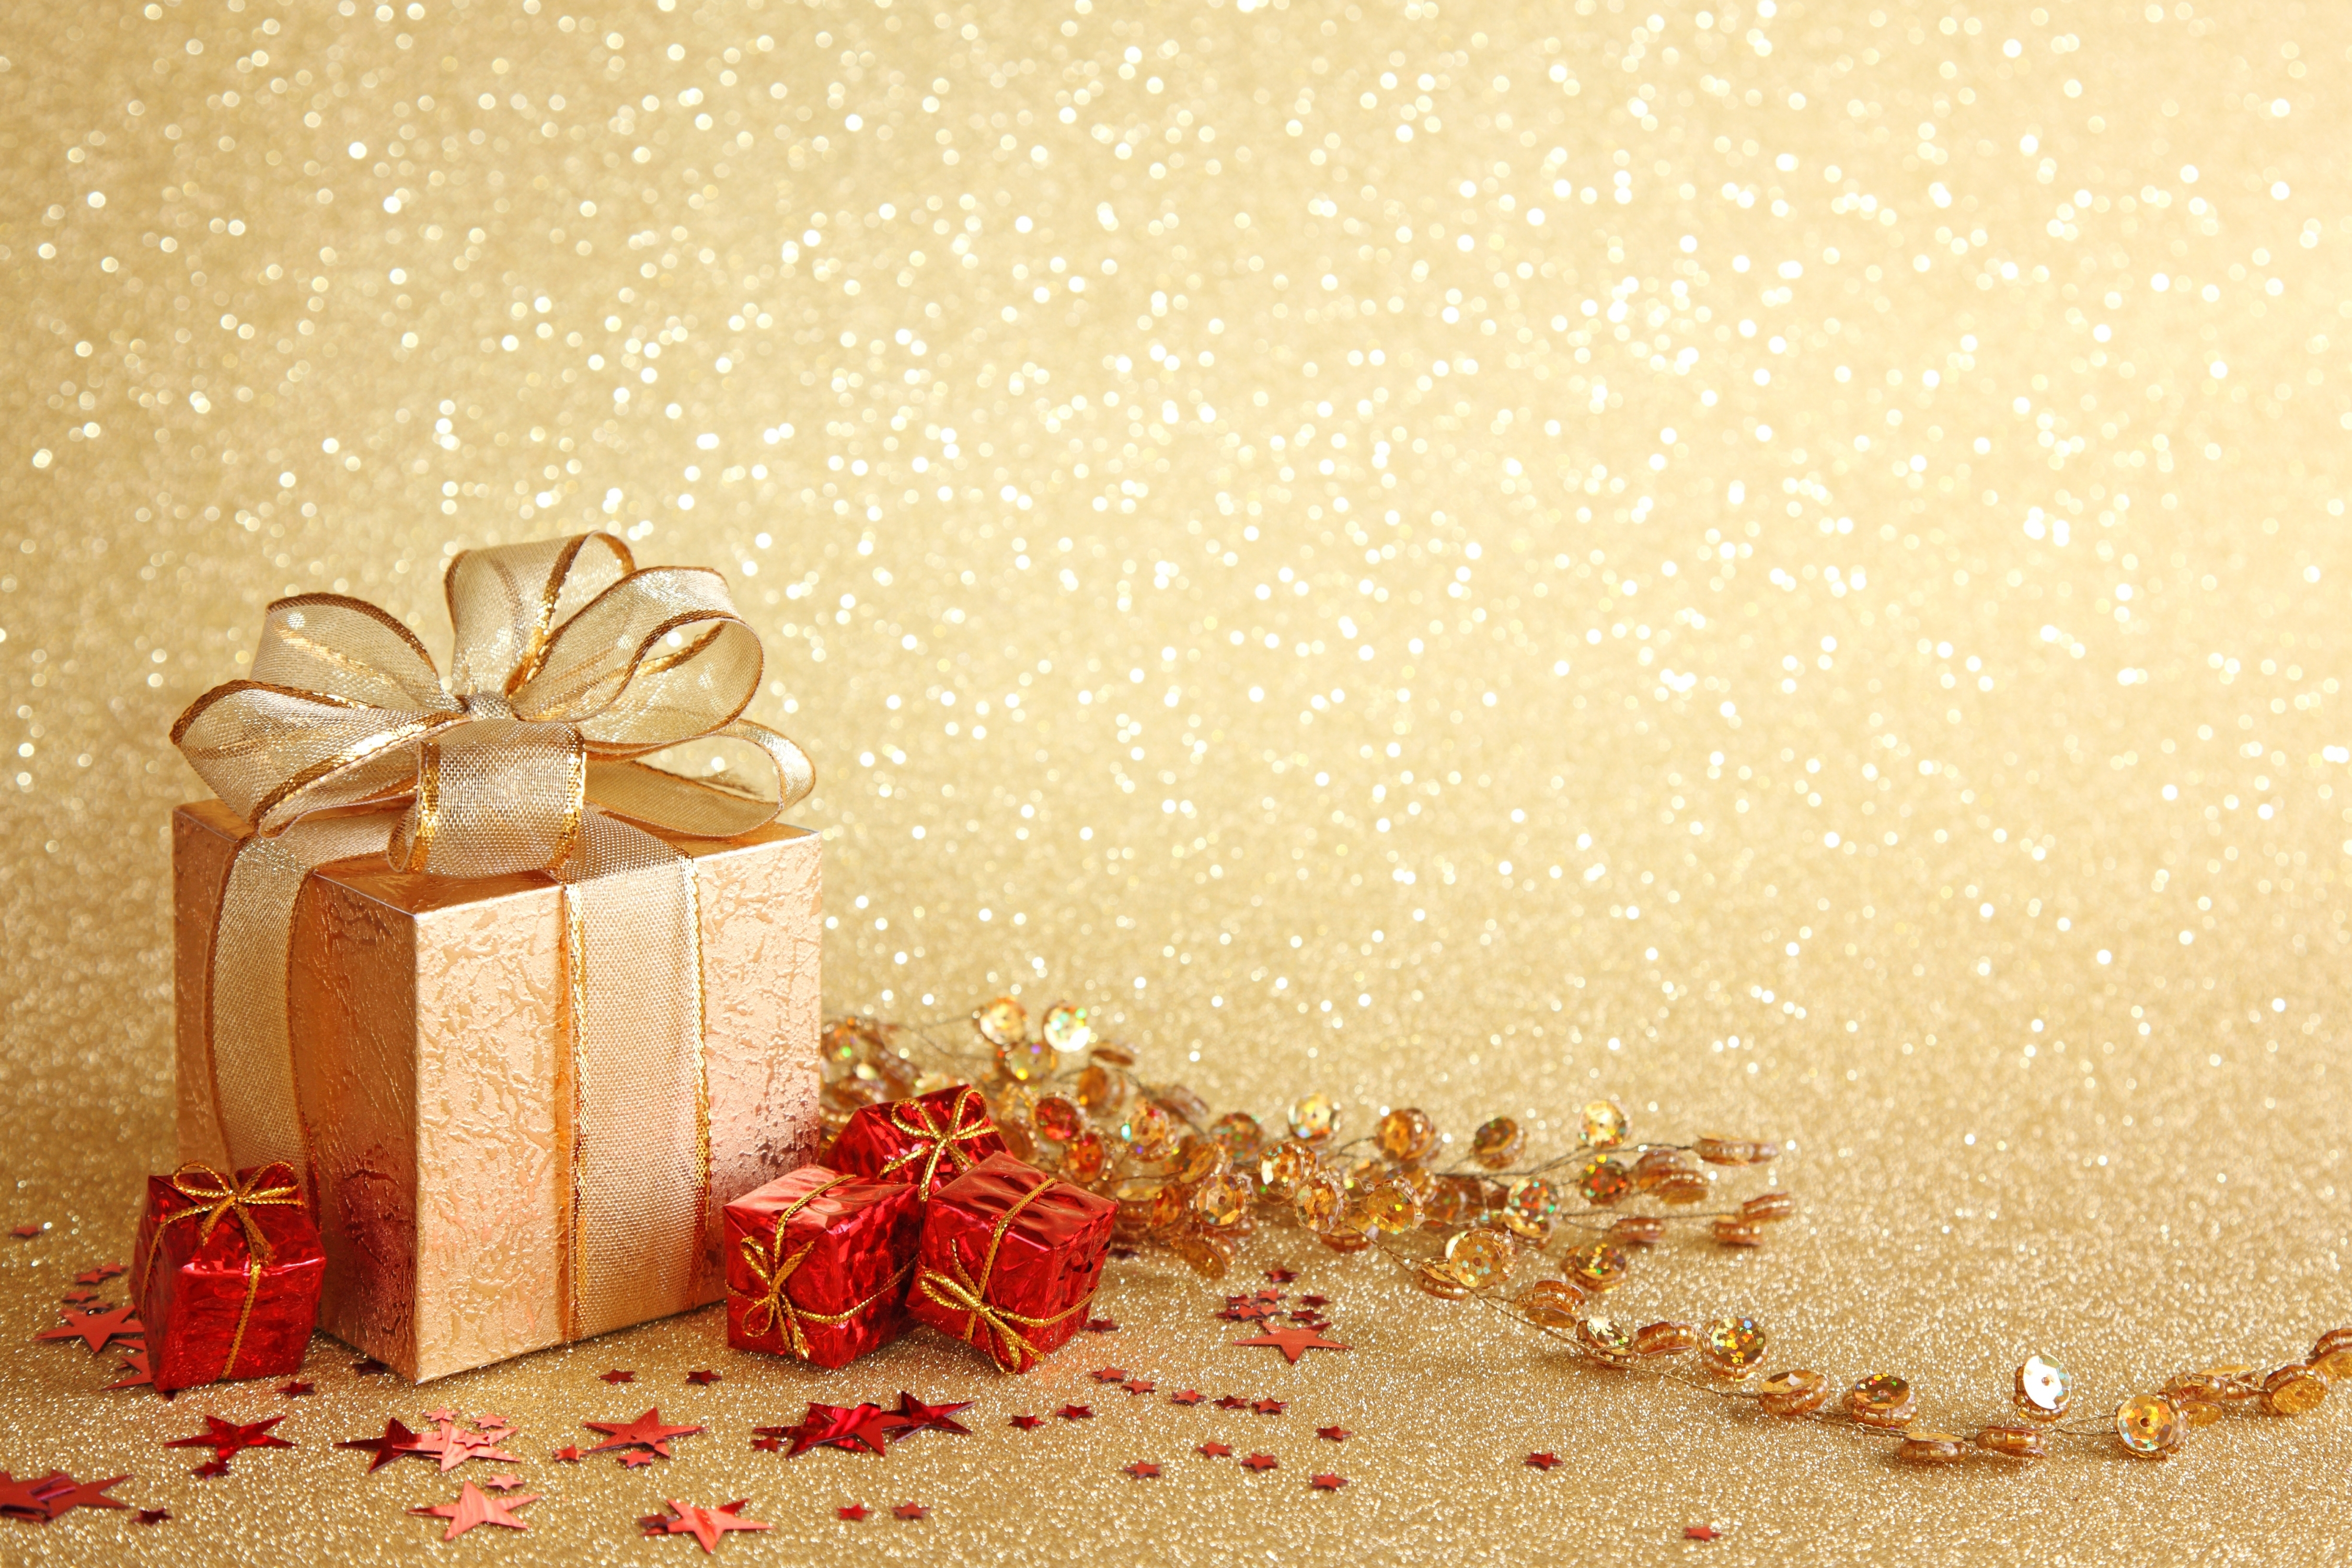 Christmas Present Wallpaper 4500x3000